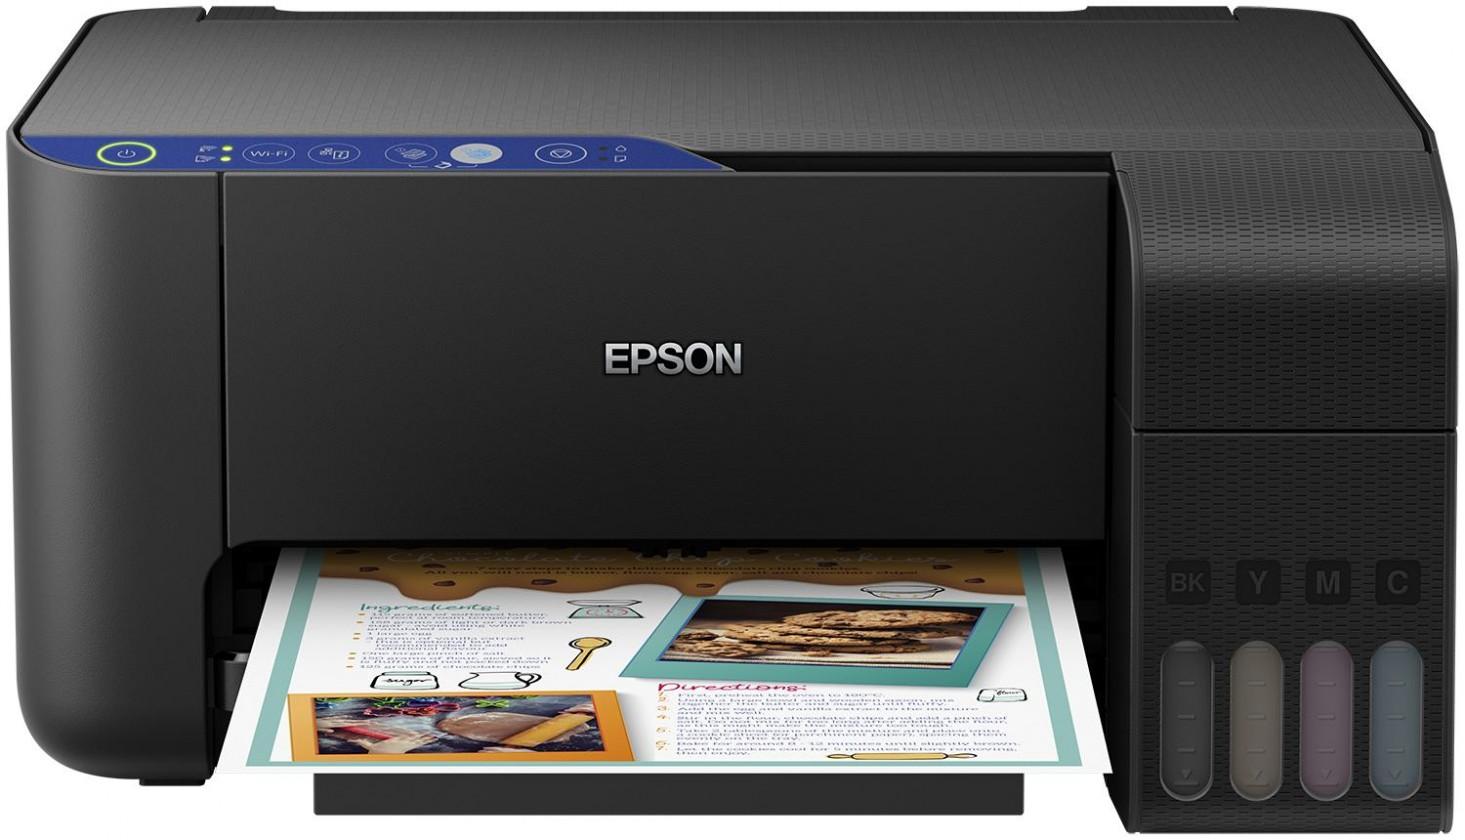 Atramentové multifunkce Multifunkčná atramentová tlačiareň Epson EcoTank L3151 farebná